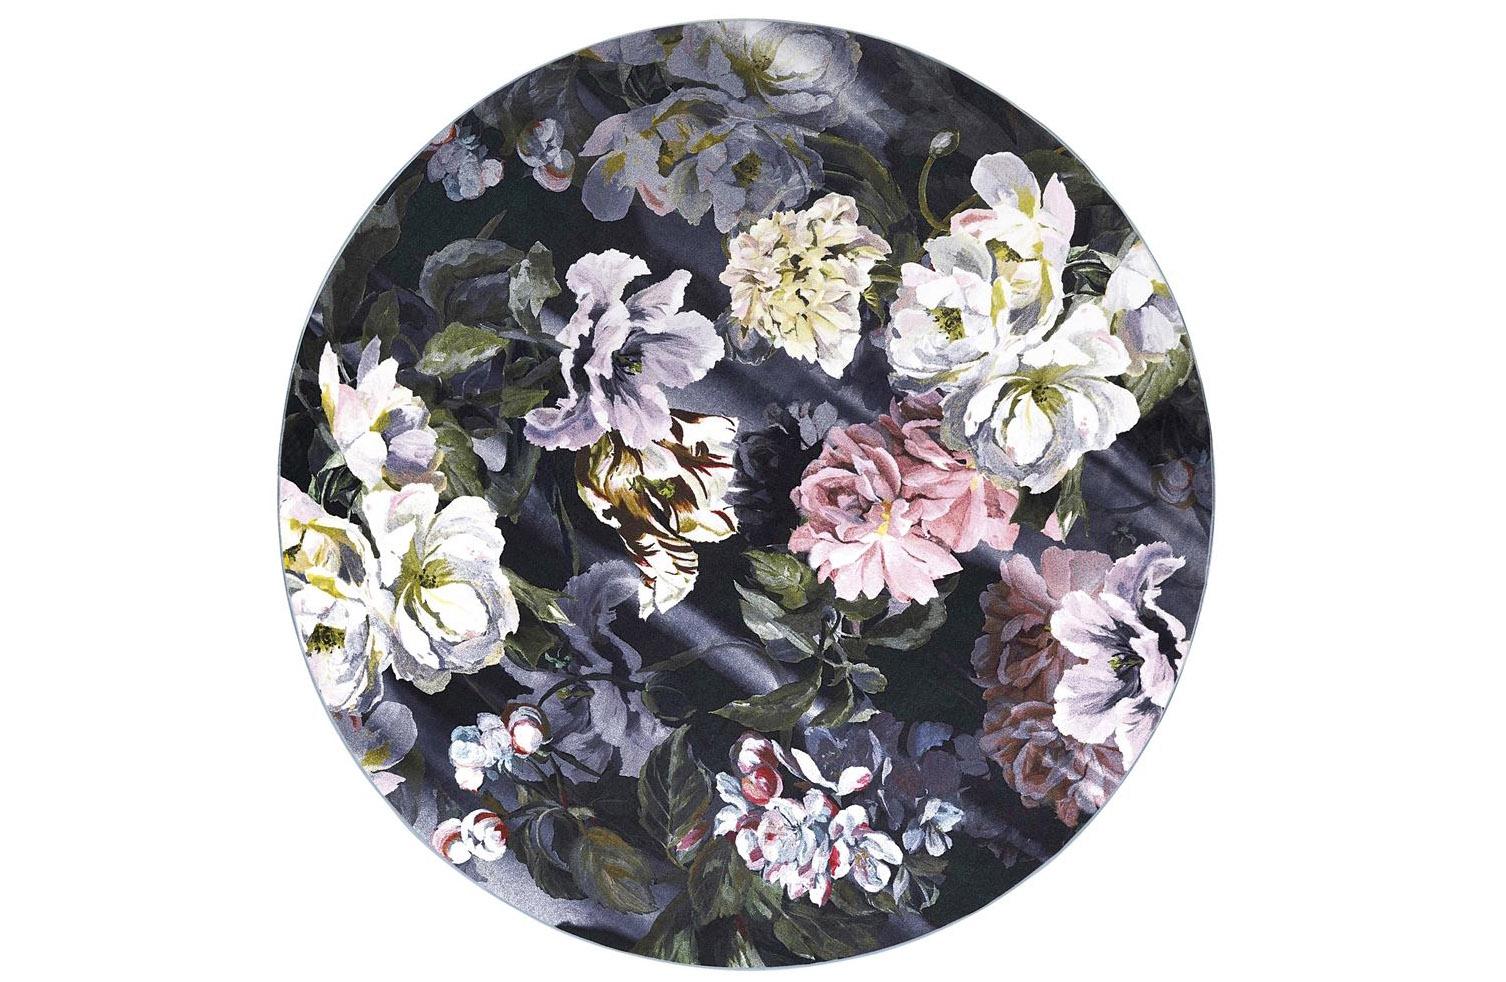 Ковер Designers Guild, Delft Flower Noir Rug - 250 x 250cm